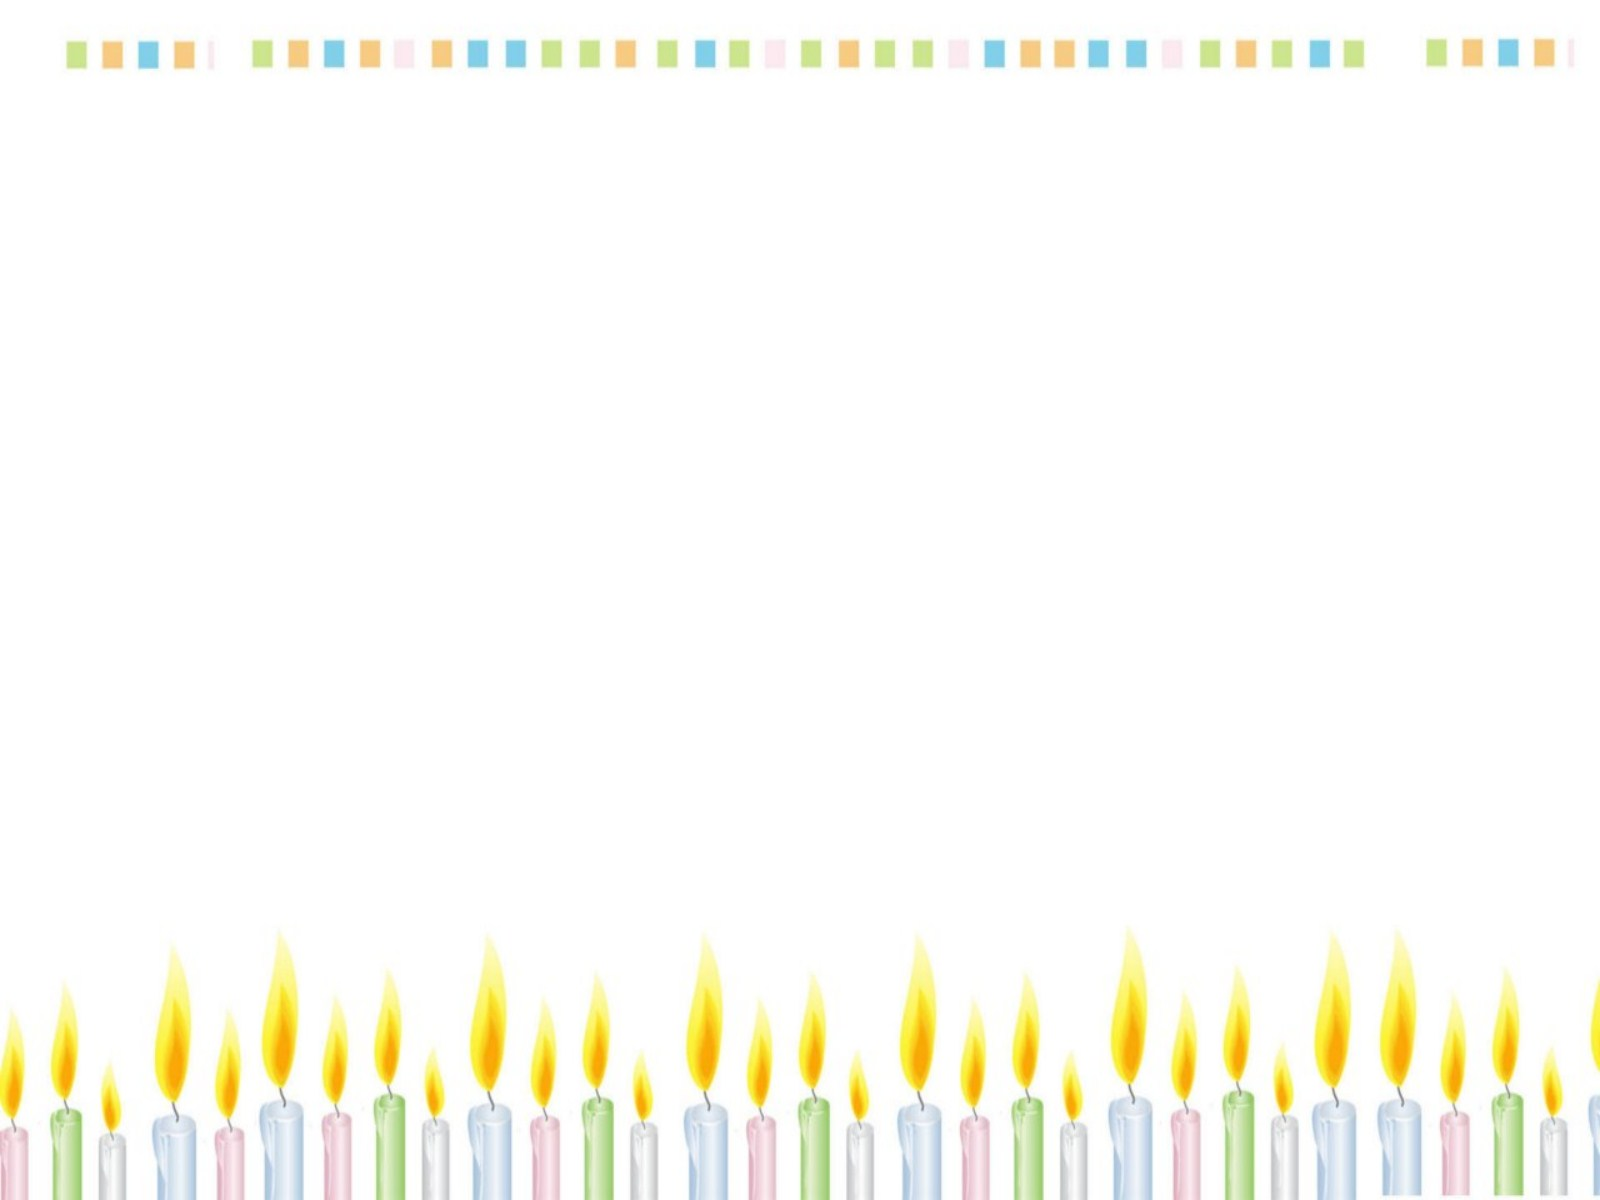 Happy Birthday Background Images Wallpaper   1600x1200   85098 1600x1200